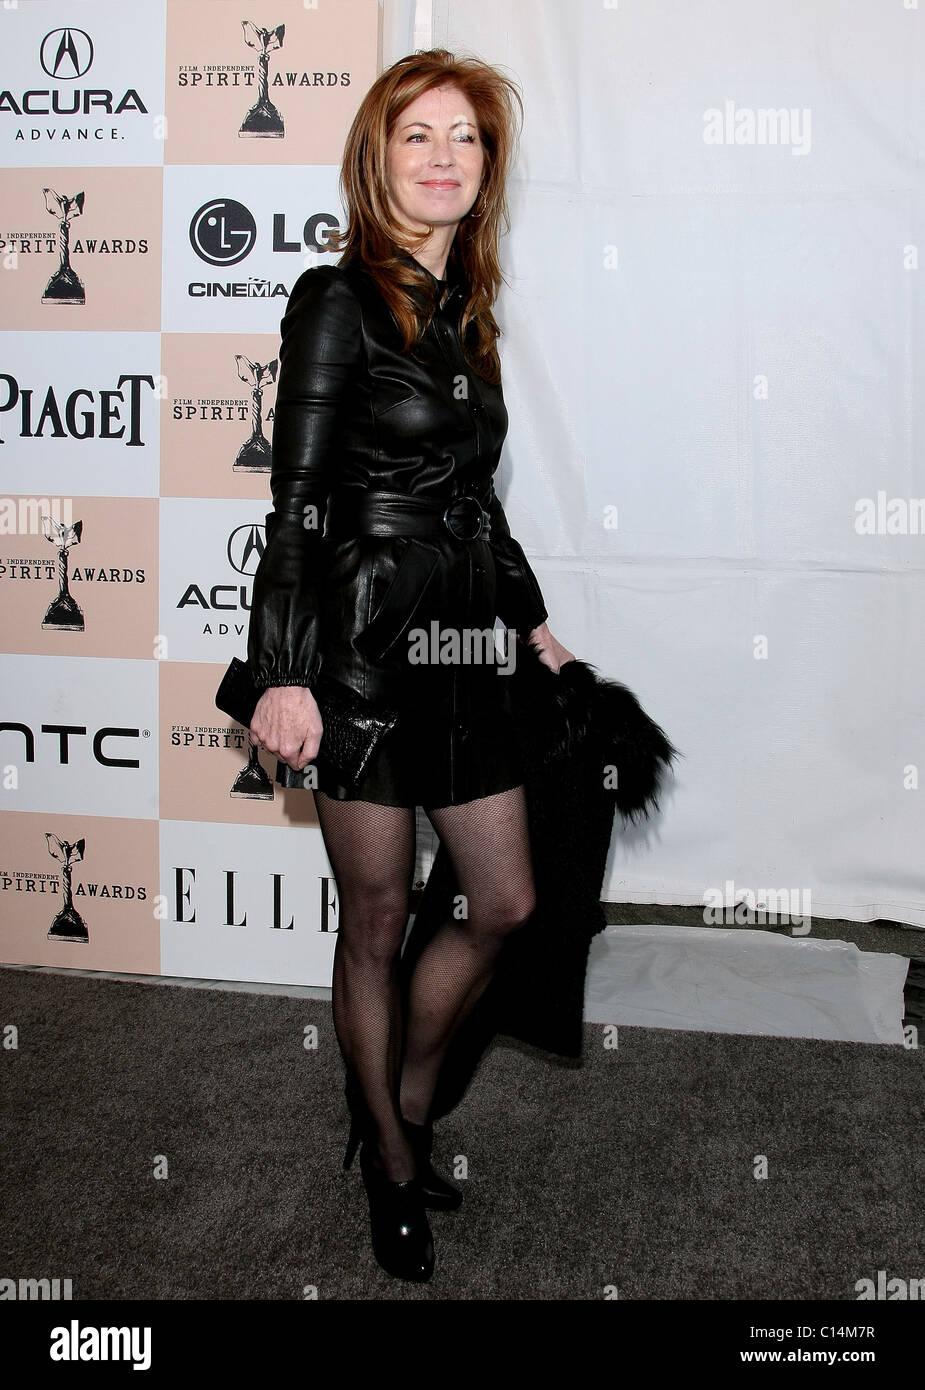 Pat Anderson (actress),Keiko Takahashi Erotic video Russell Brand (born 1975),L'Wren Scott